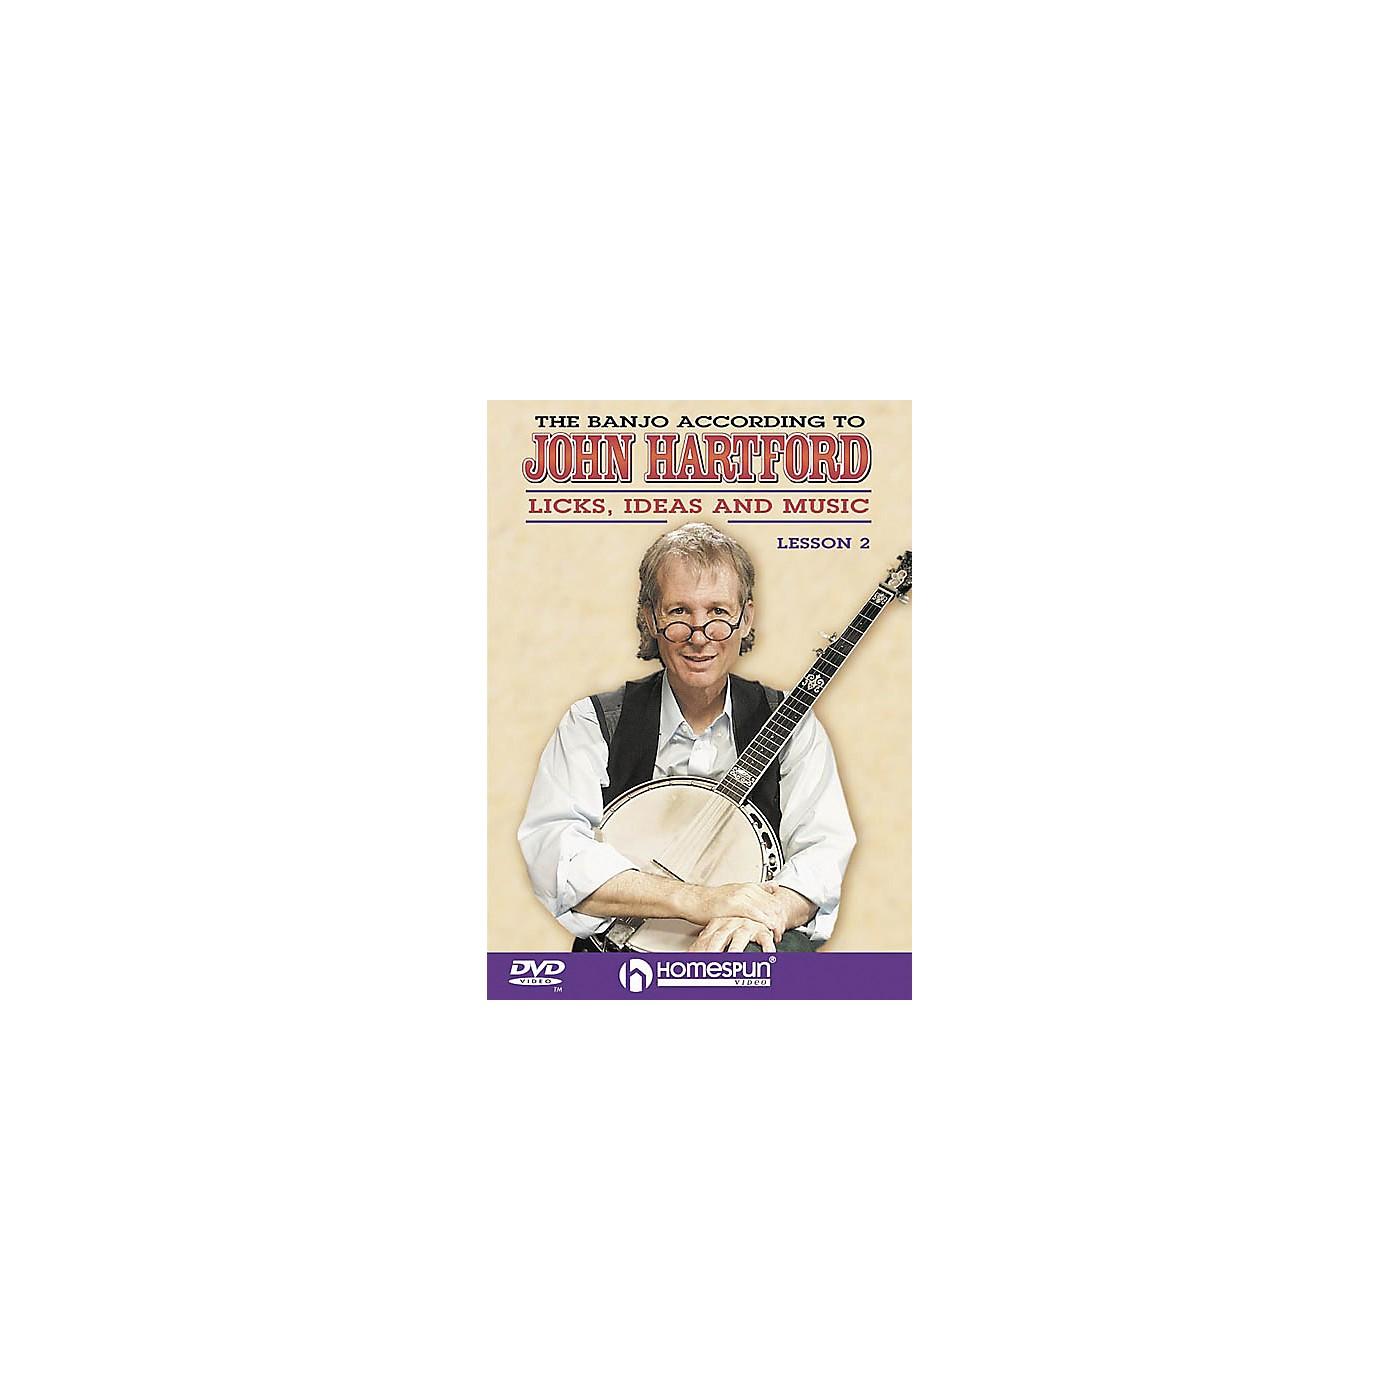 Homespun The Banjo According to John Hartford 2 (DVD) thumbnail